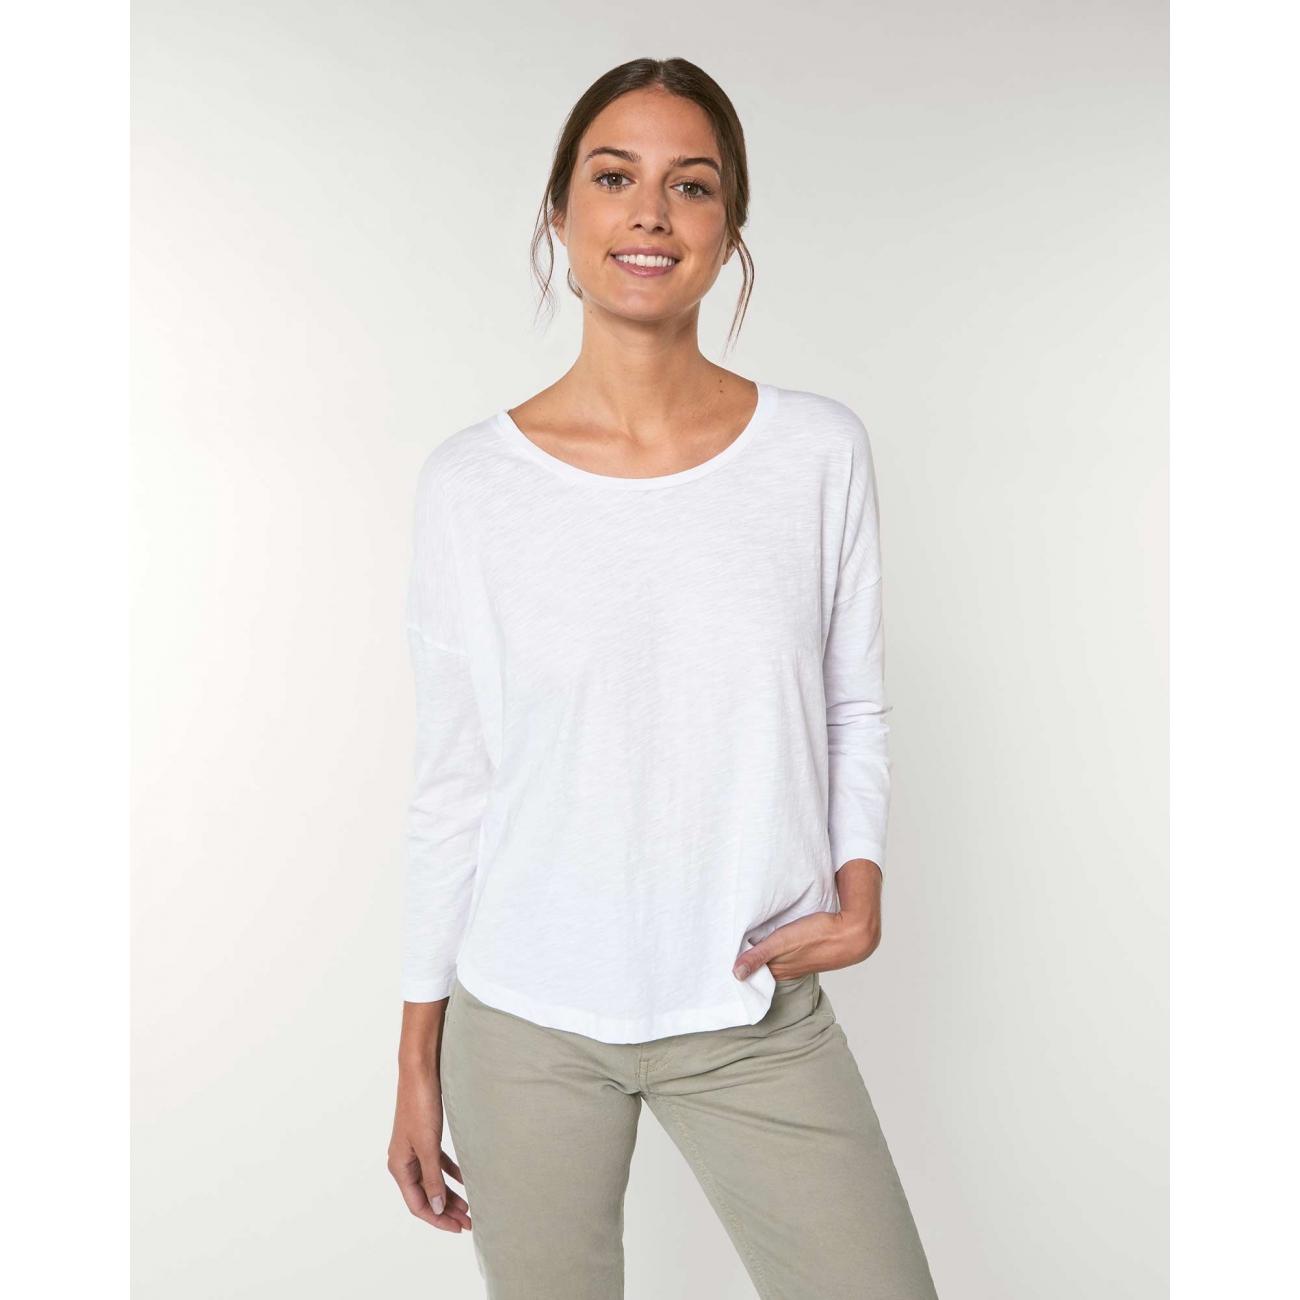 https://tee-shirt-bio.com/9199-thickbox_default/tshirt-femme-manches-34-epaules-tombantes-manches-serrees-coton-bio-fwf-blanc-flamme-.jpg